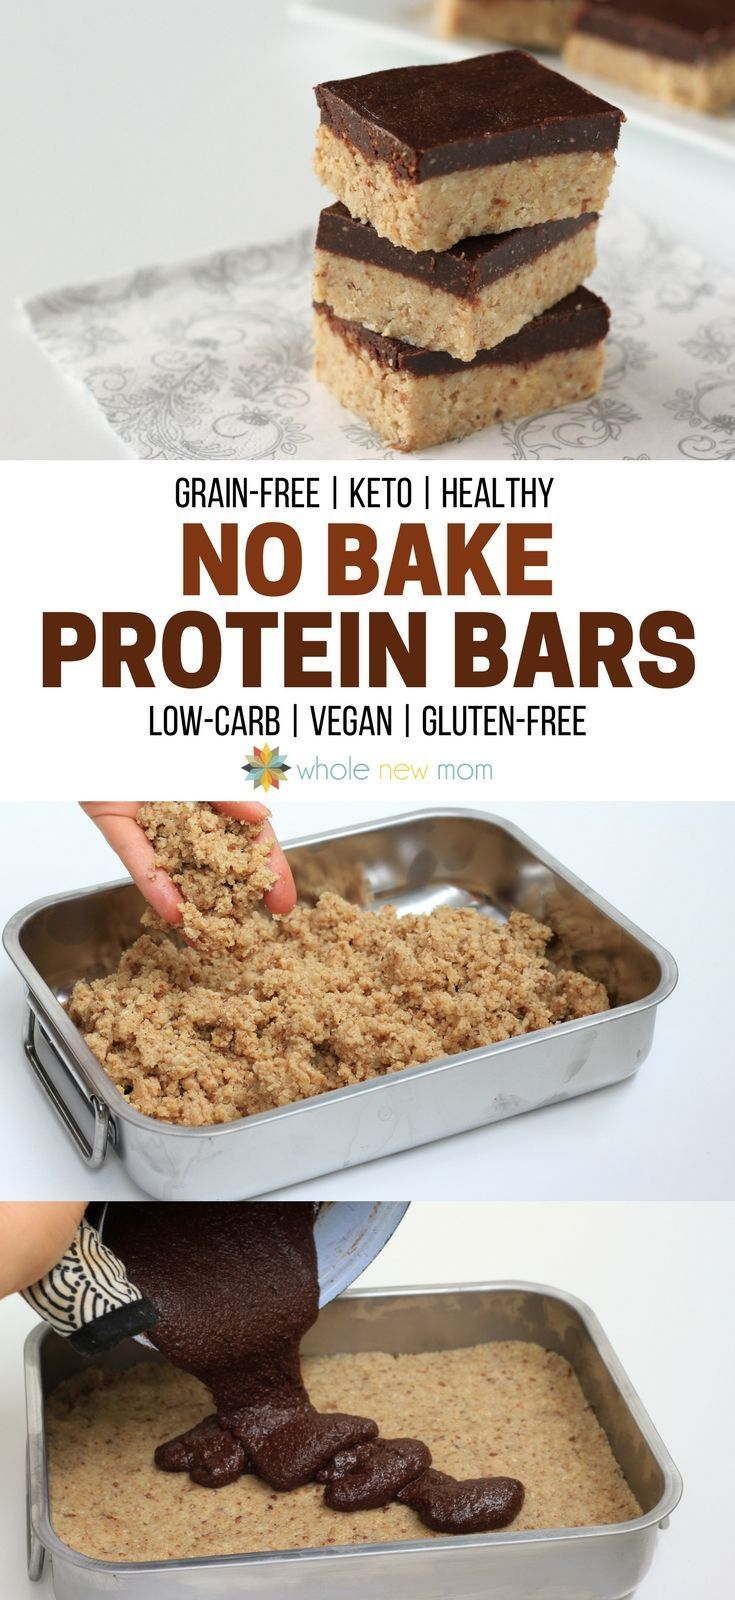 Grain Free No Bake Homemade Protein Bars Recipe Healthy Protein Snacks Protein Bar Recipes No Bake Protein Bars